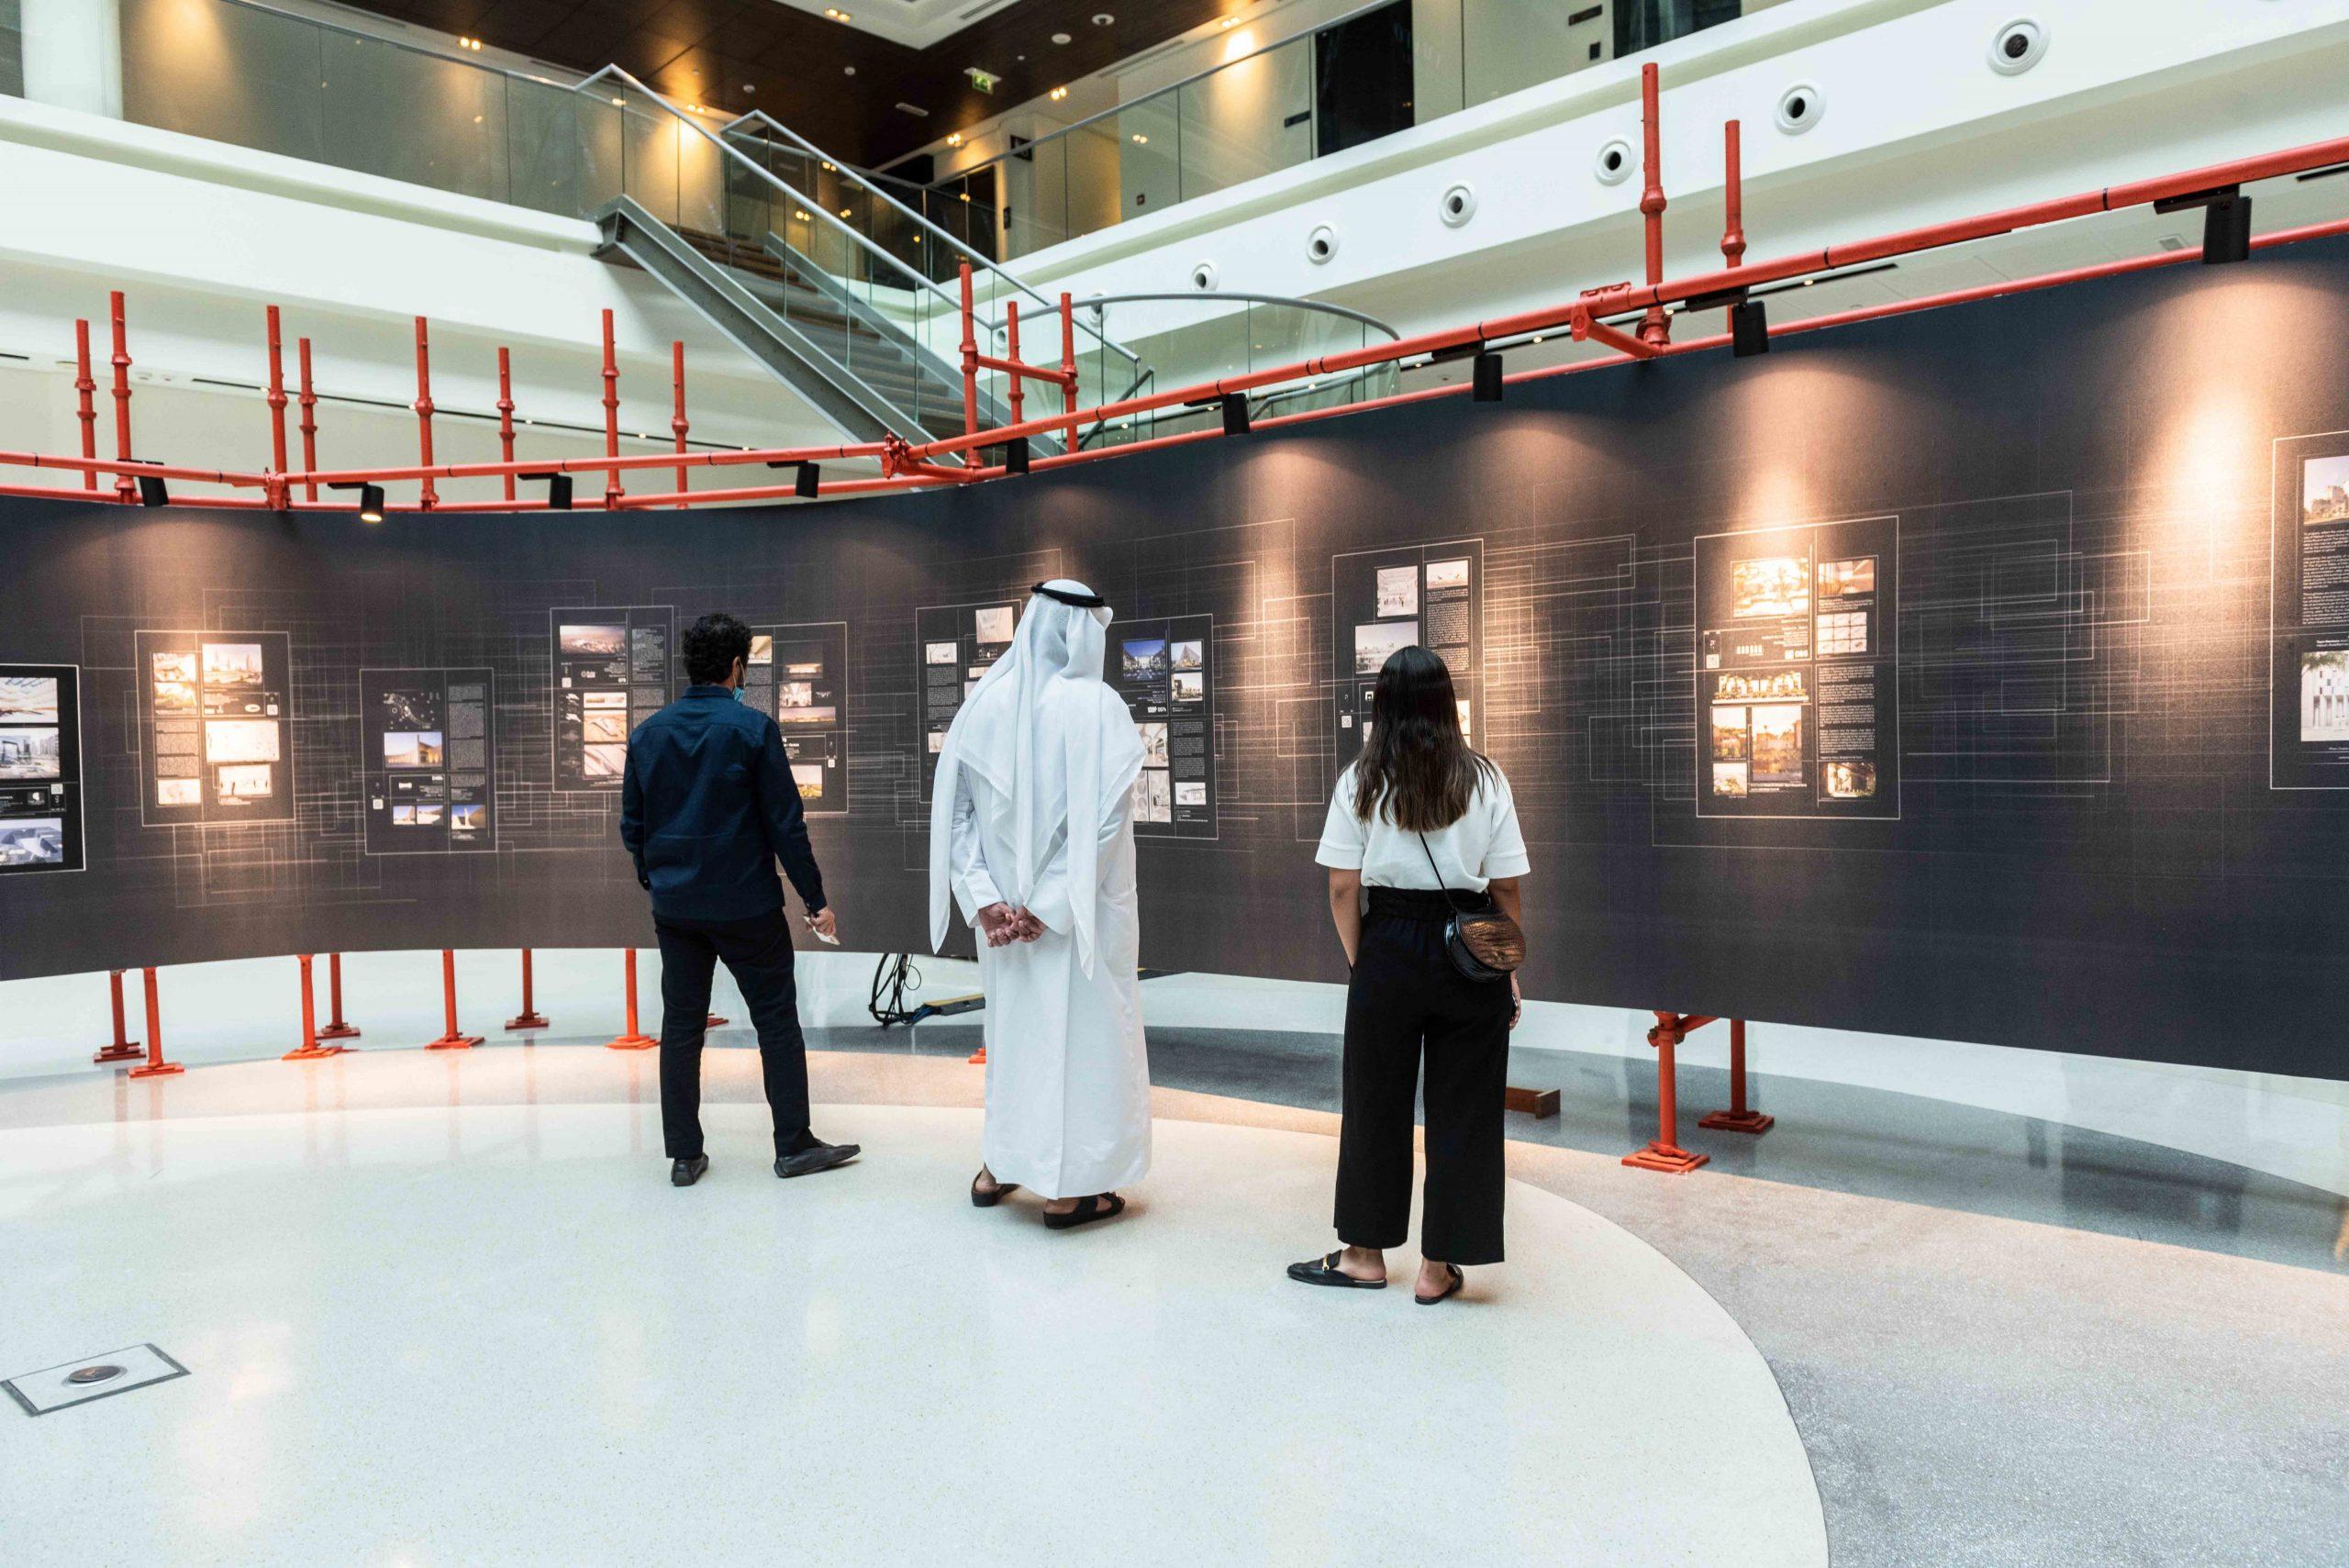 d3 Architecture Festival - Courtesy of Dubai Design Week.